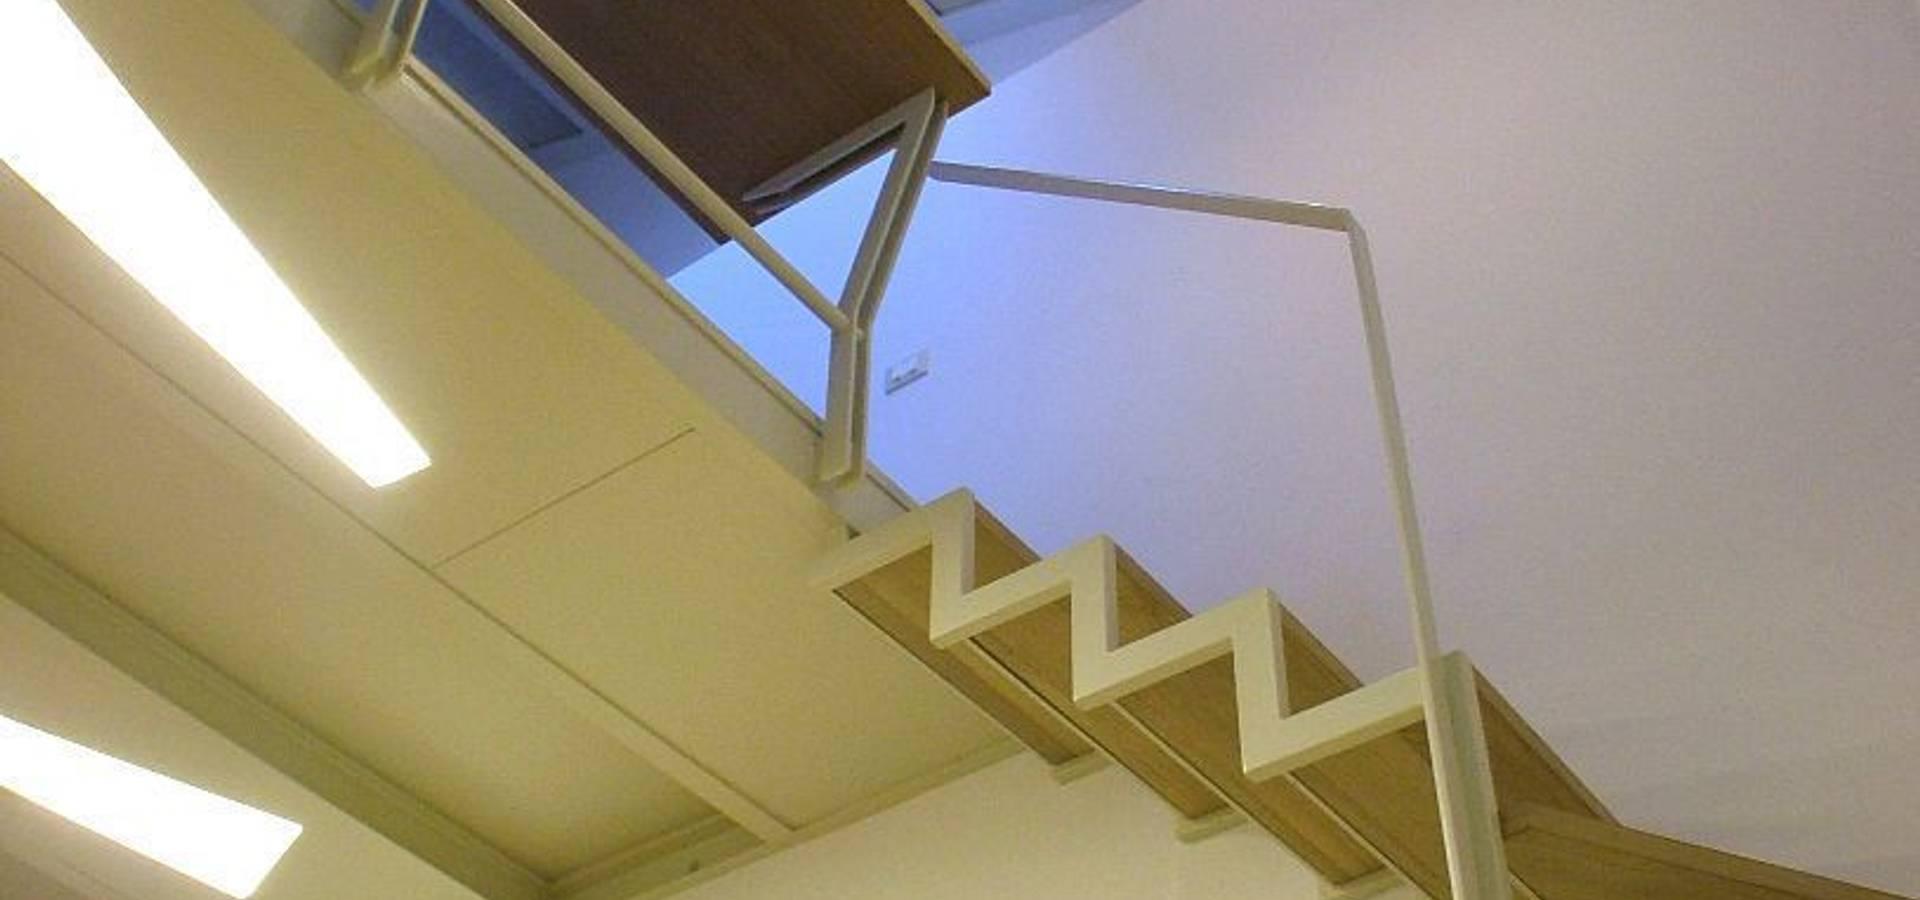 ellenia+tre architettura e ingegneria